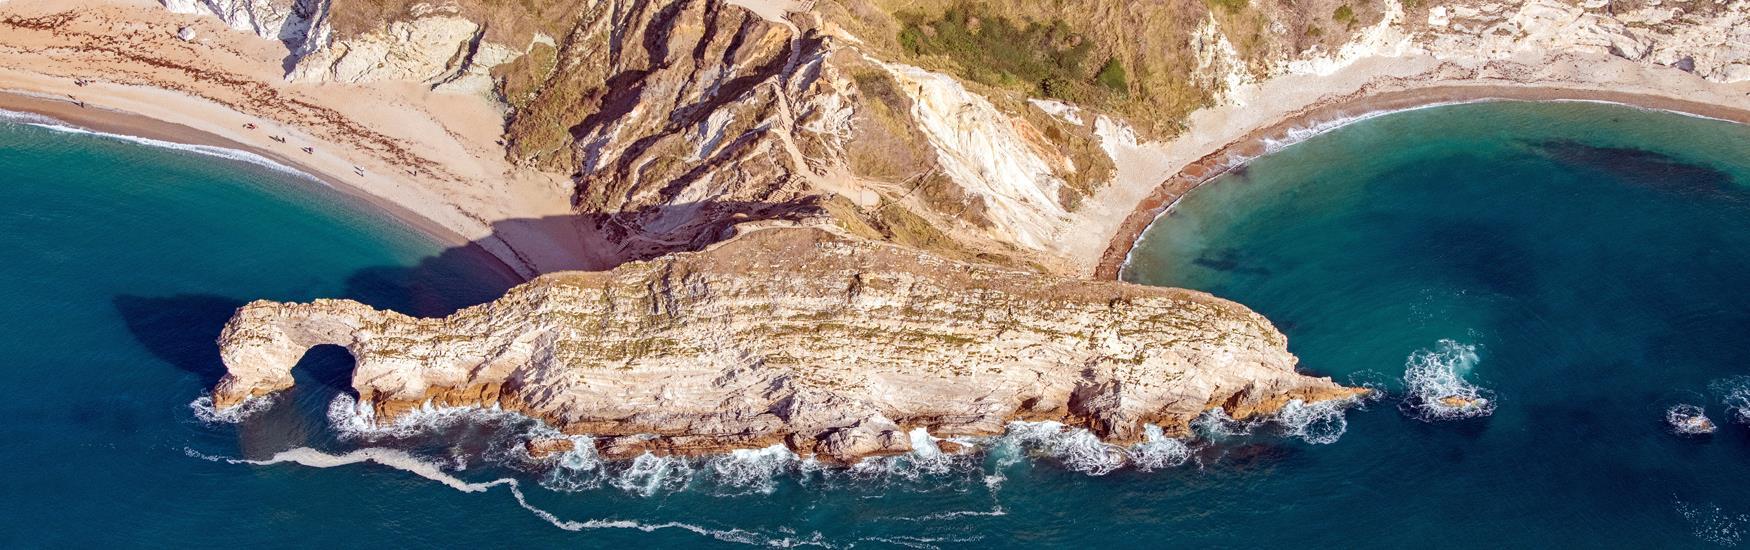 Dorset Jurassic Coastline including Durdle Door